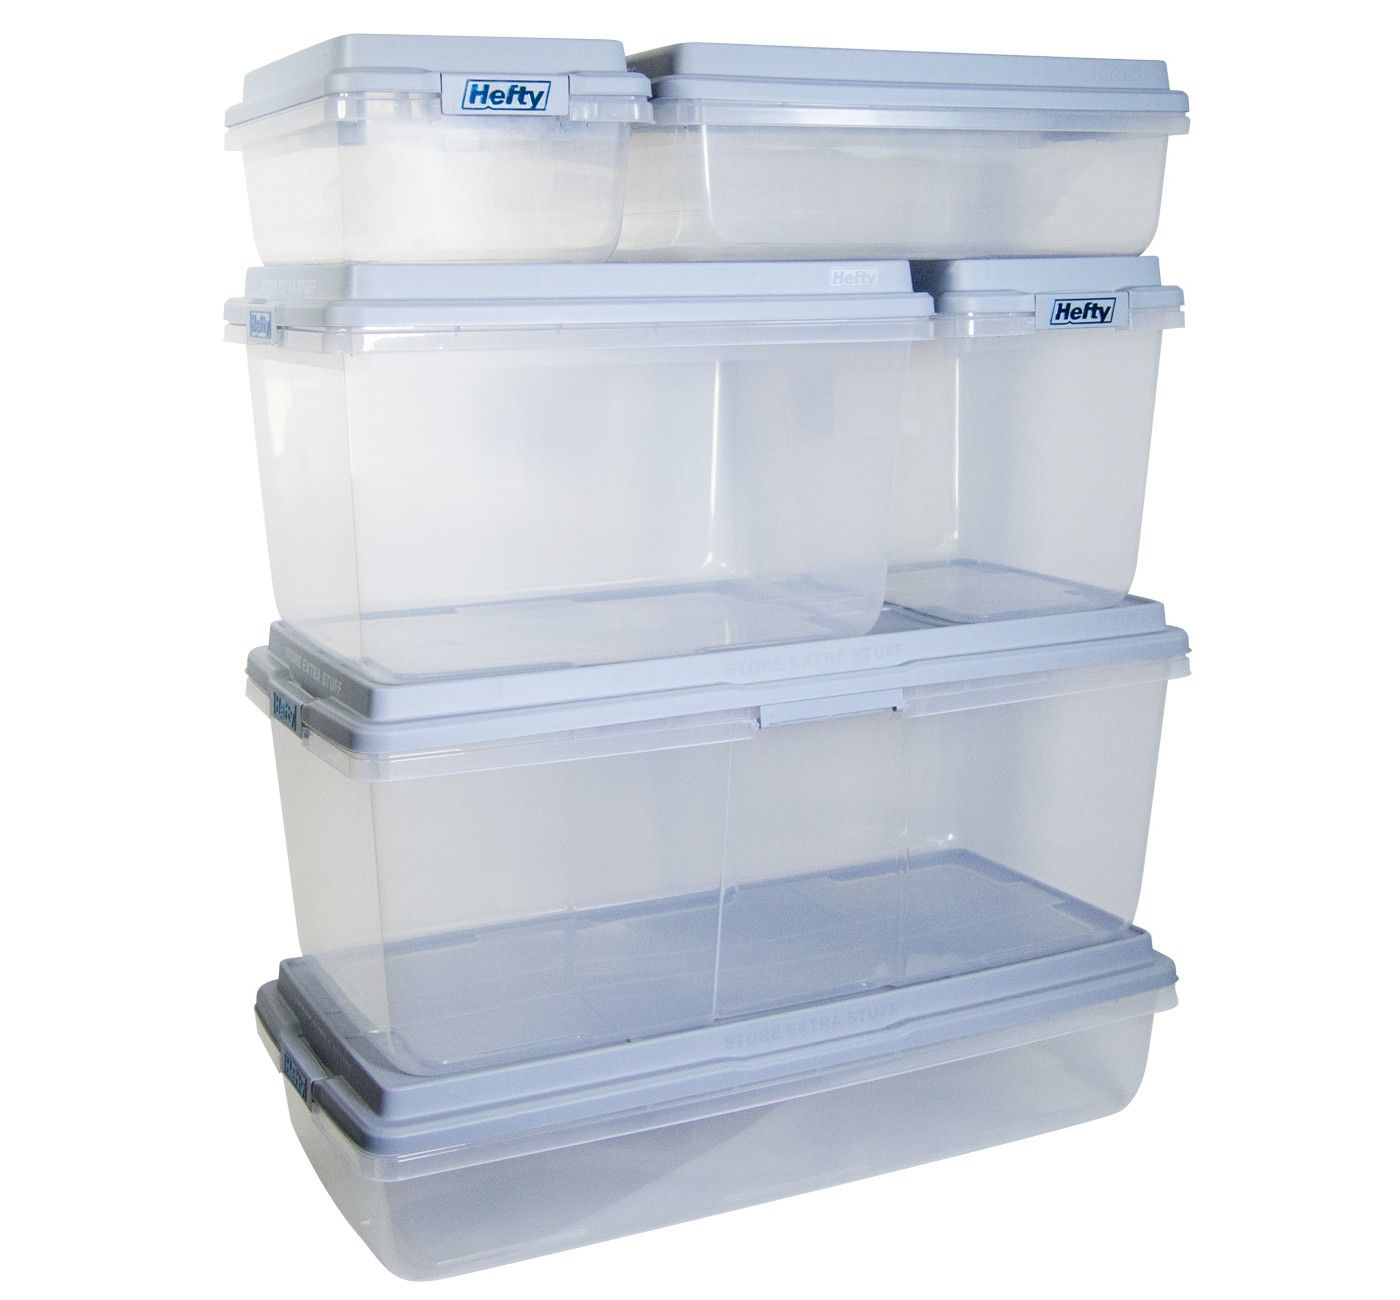 Hefty 18qt Plastic Storage Bin with Gray HIRISE Stackable